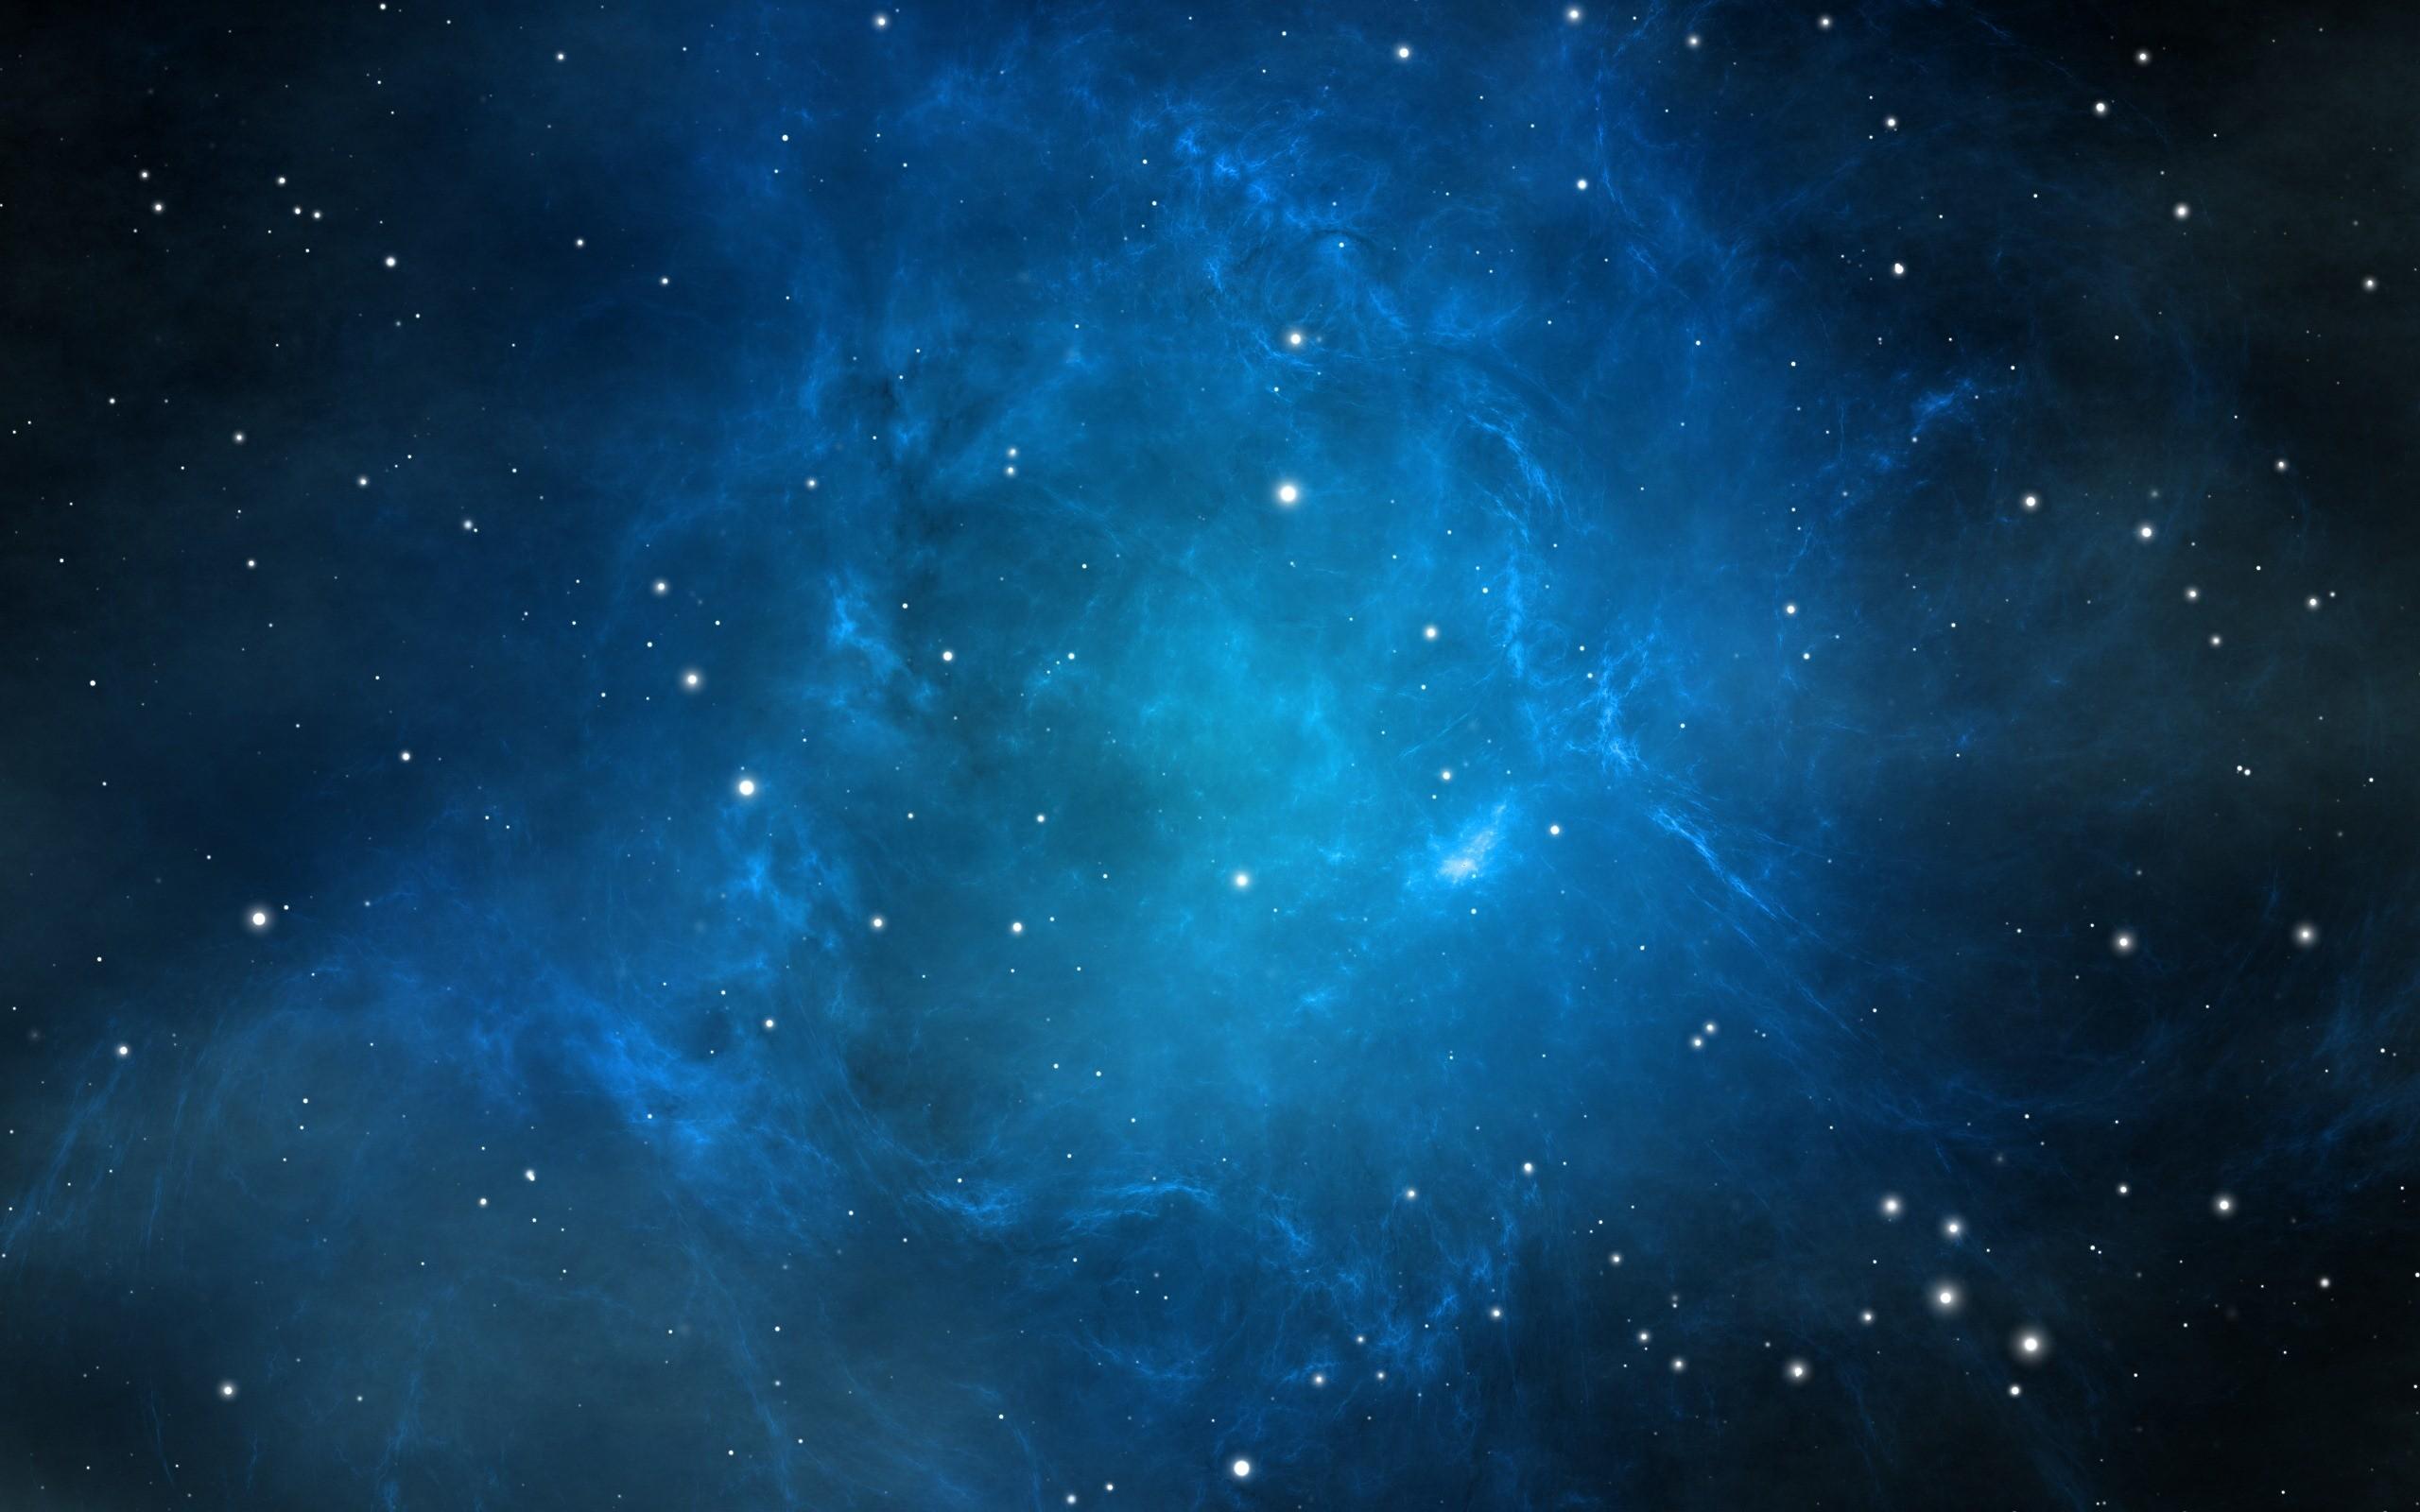 Black-Stars-Wallpaper-HD-Download.jpg (2560×1600)   blastoff   Pinterest    Wallpaper and Digital art